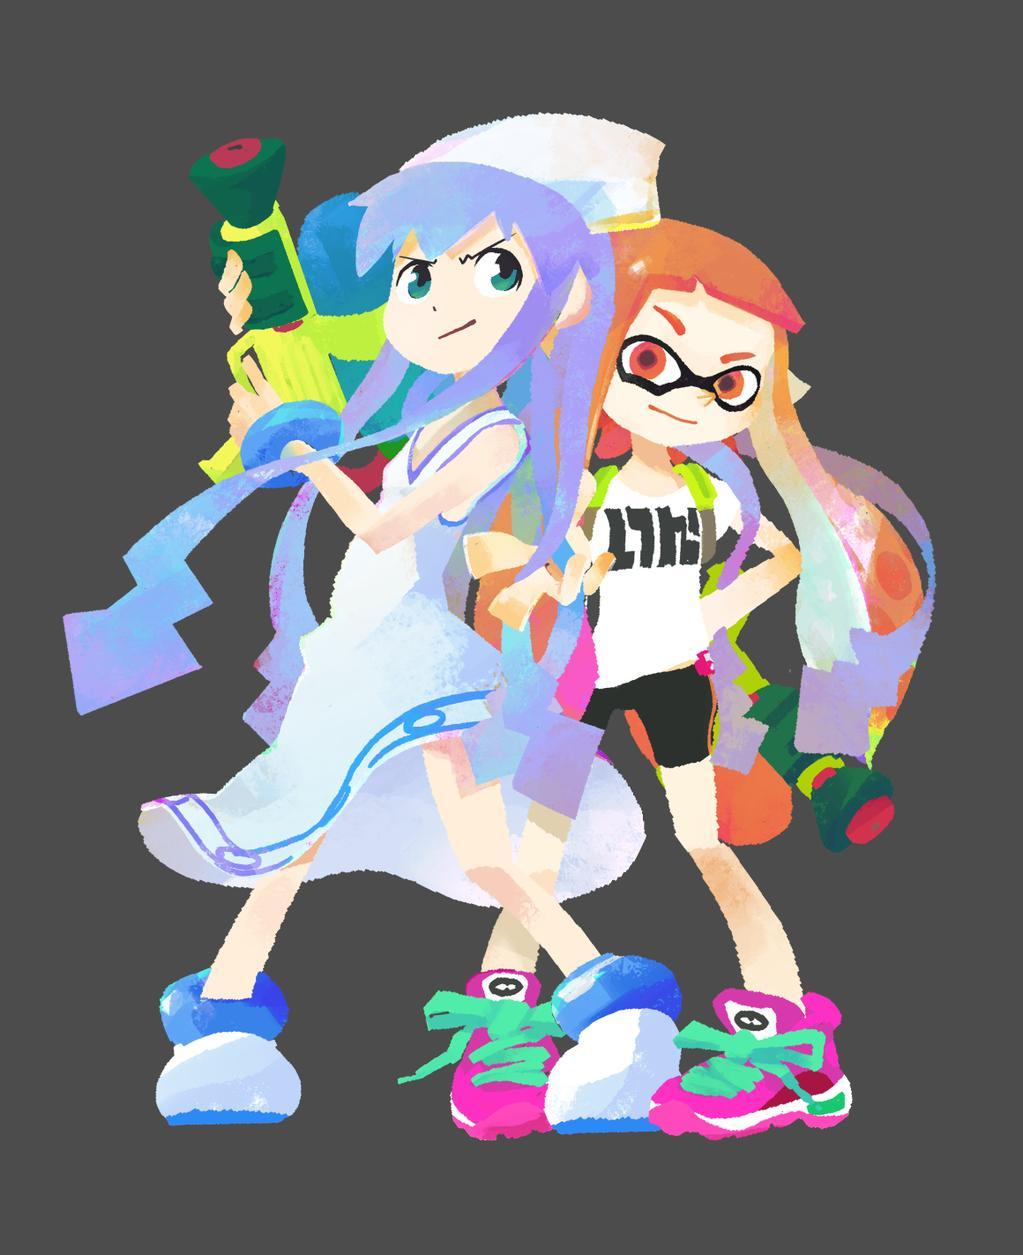 Splatoon Squid Girl Costume : カレンダー 2015 イラストレーター : イラスト